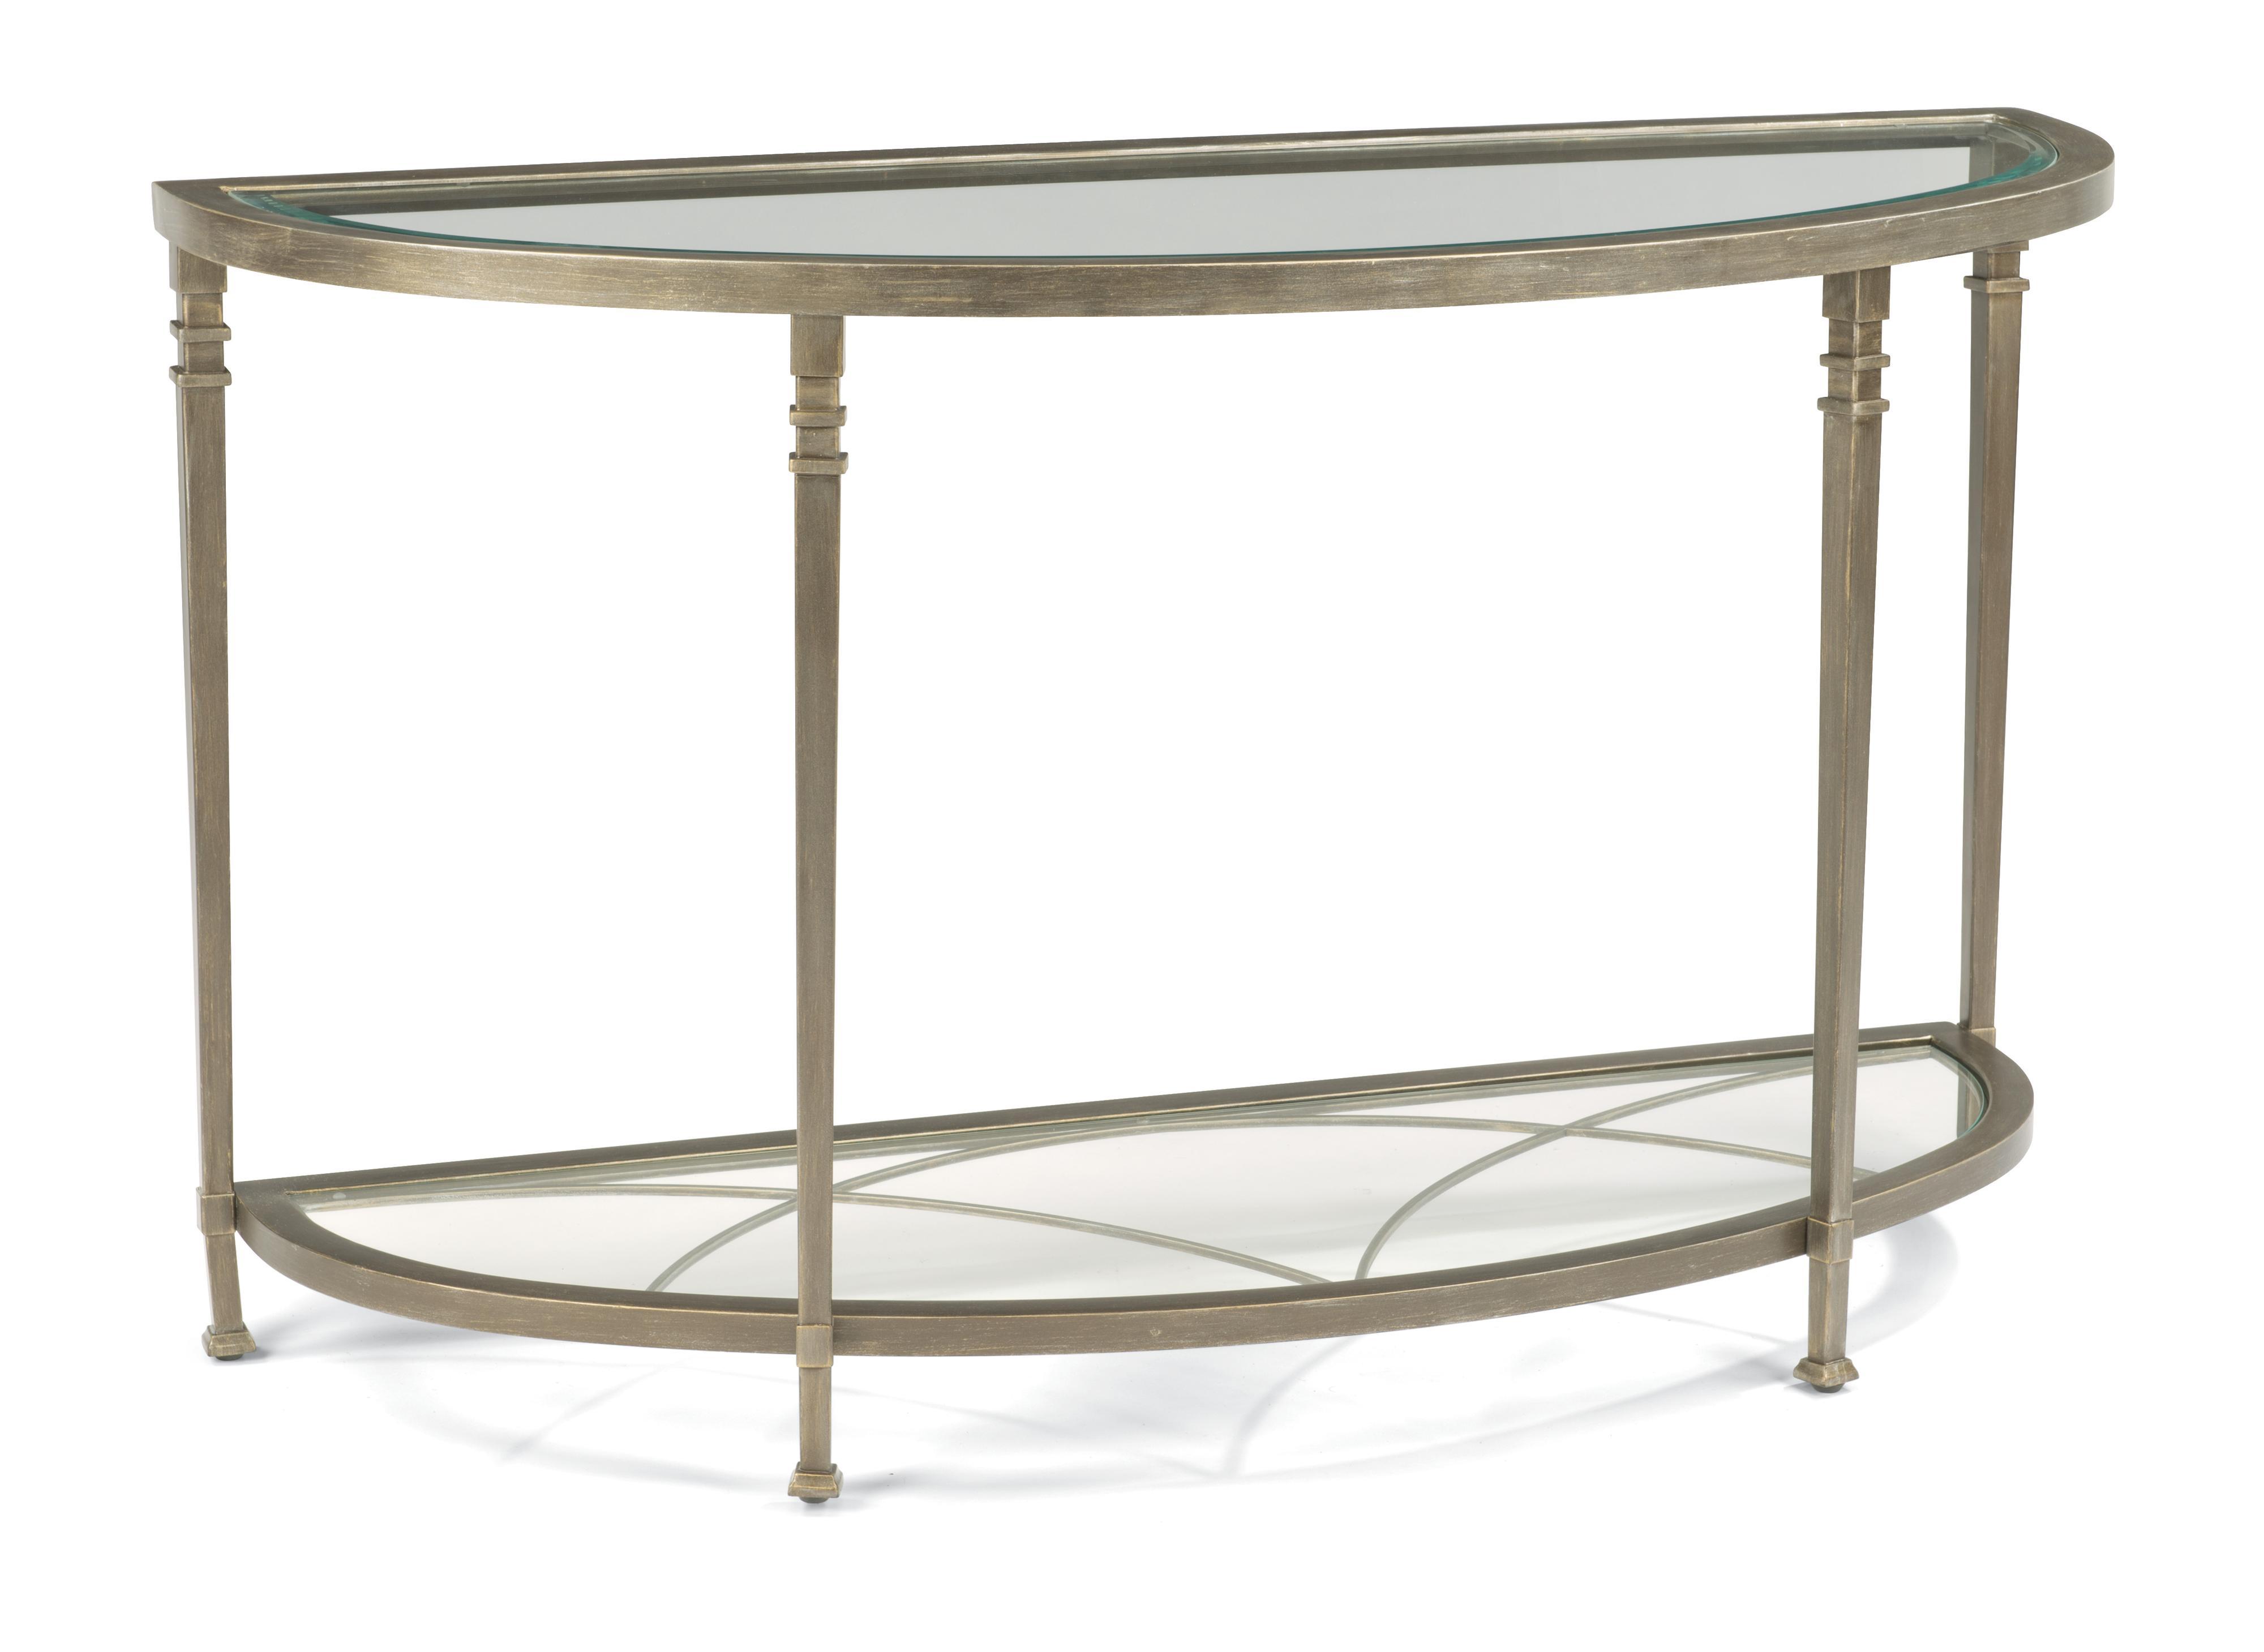 Flexsteel Atrium Sofa Table - Item Number: 6725-04